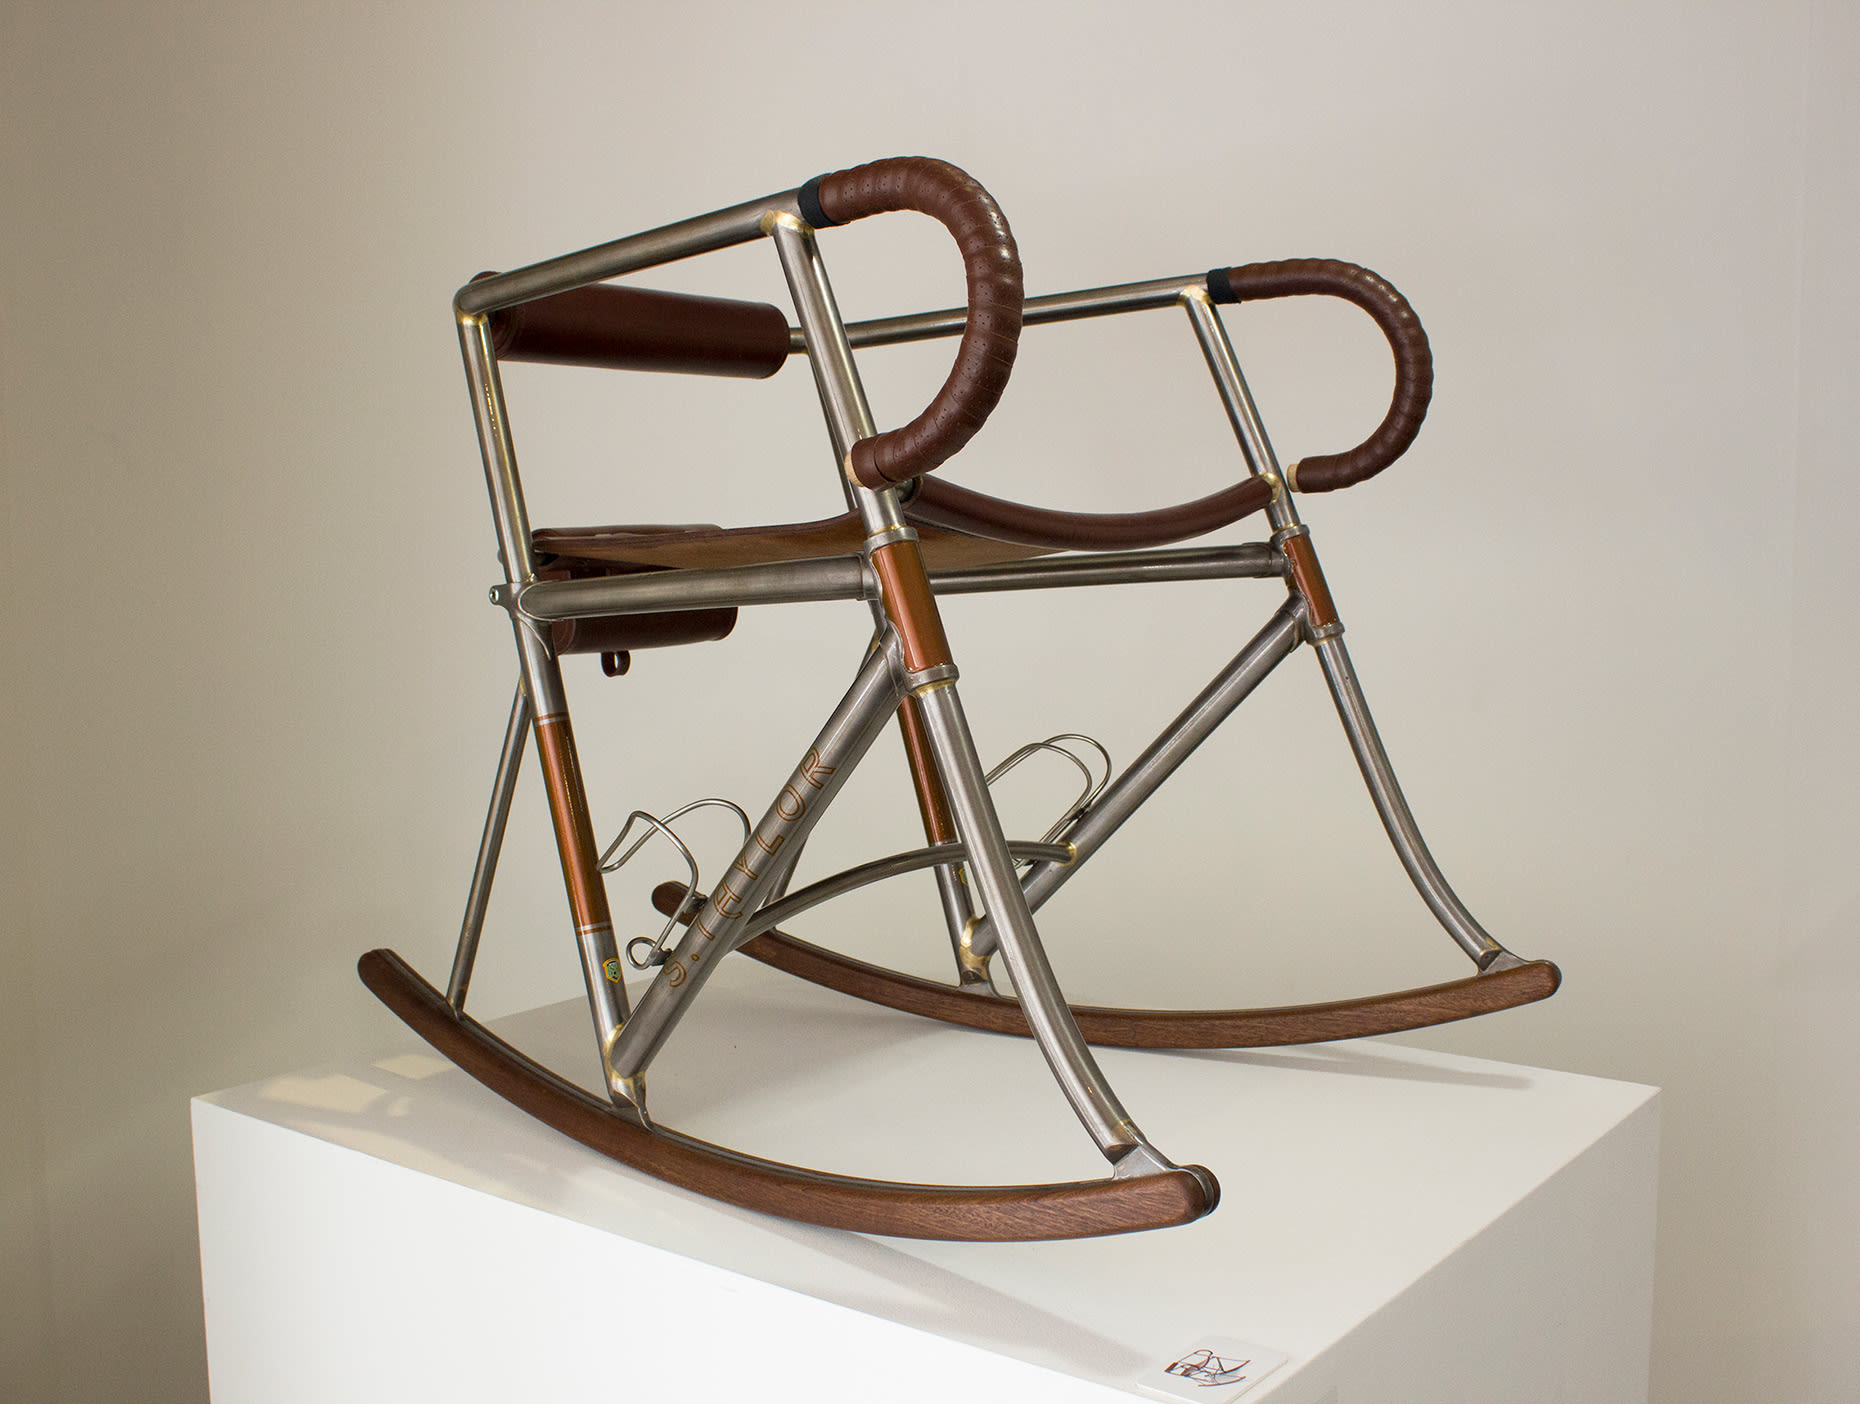 camberwell-ba-3d-design-Simon-Taylor-1860.jpg